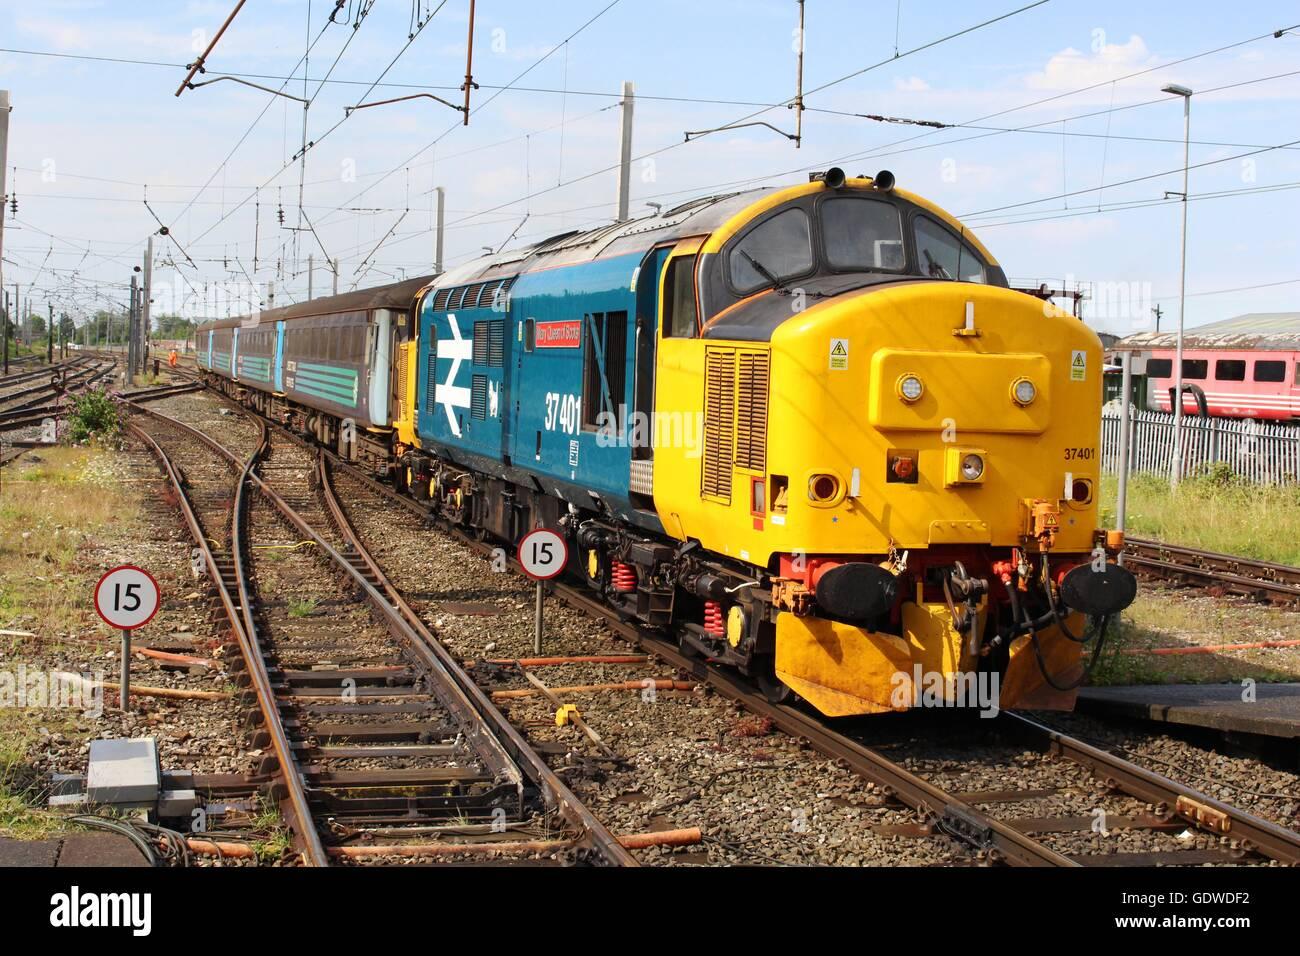 Class 37 Diesel Electric Locomotive Stock Photos & Class 37